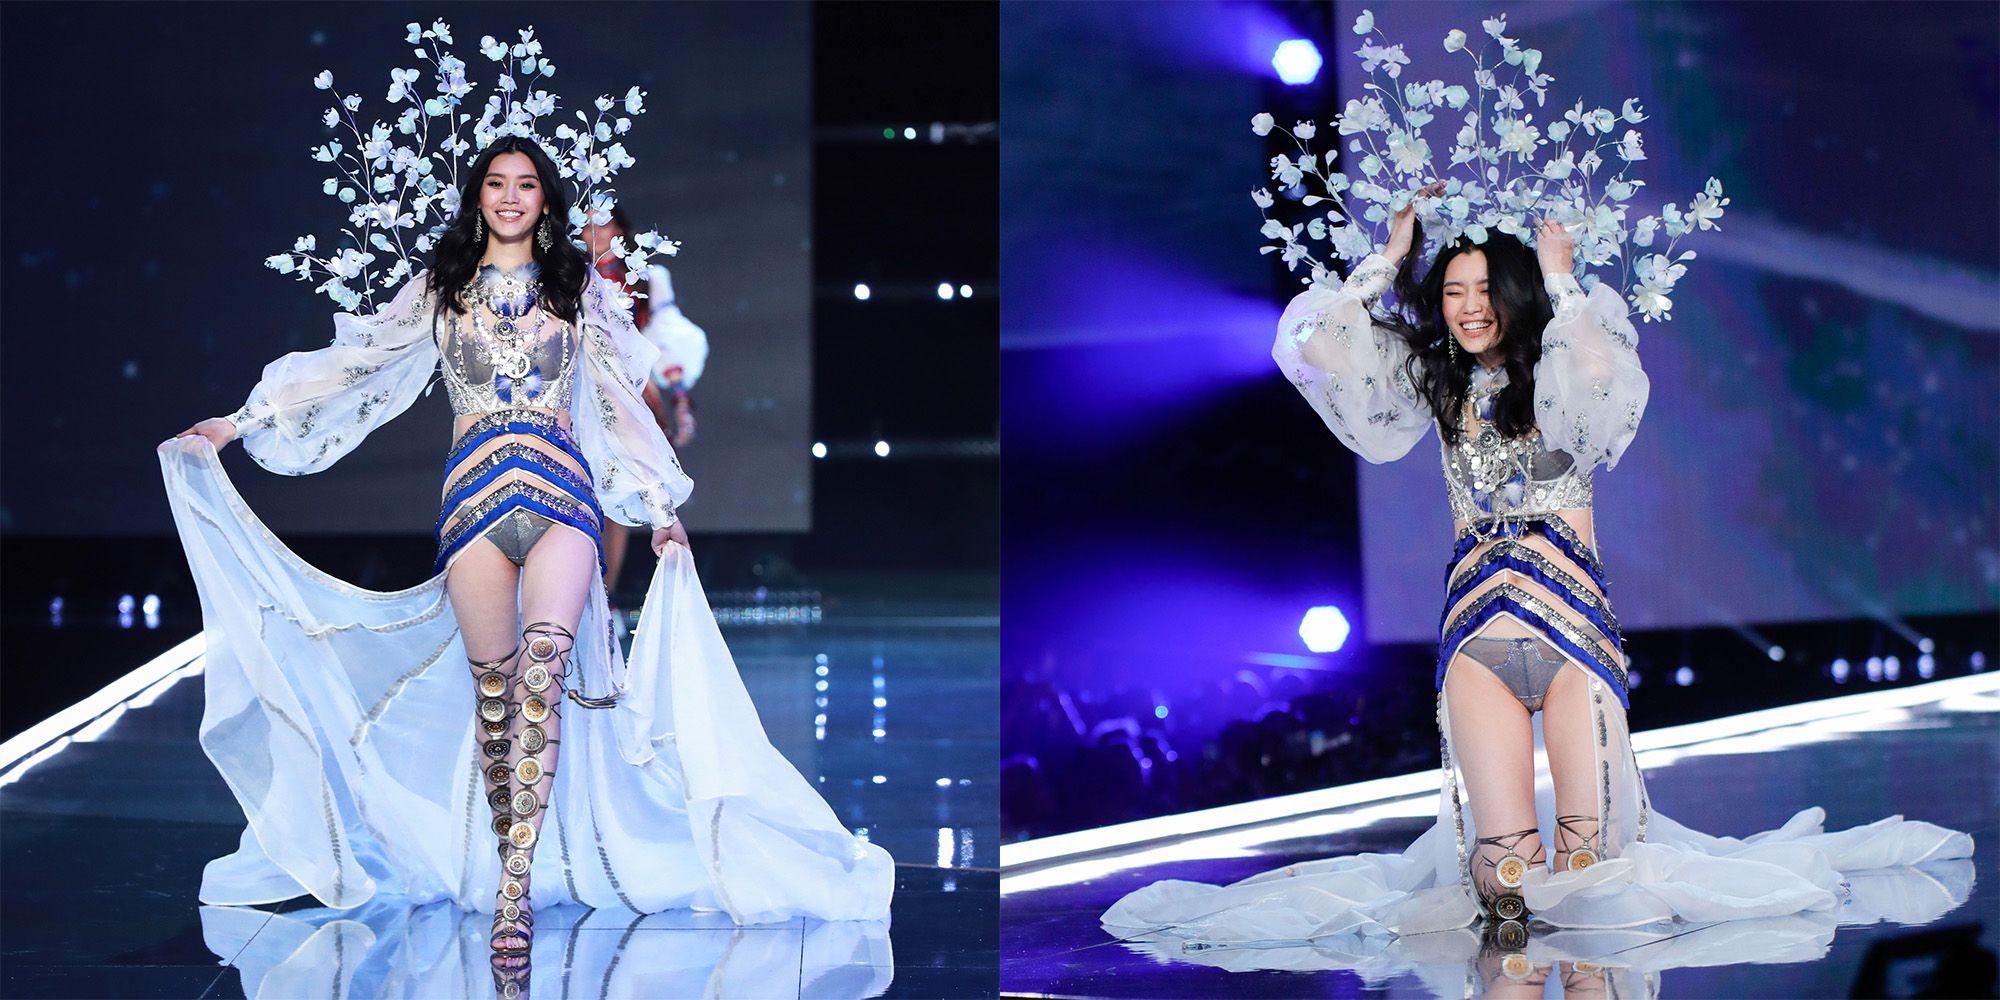 26d06ae30f Ming Xi Responds to Falling at the Victoria s Secret Fashion Show - Ming Xi  Falls at VS Fashion Show